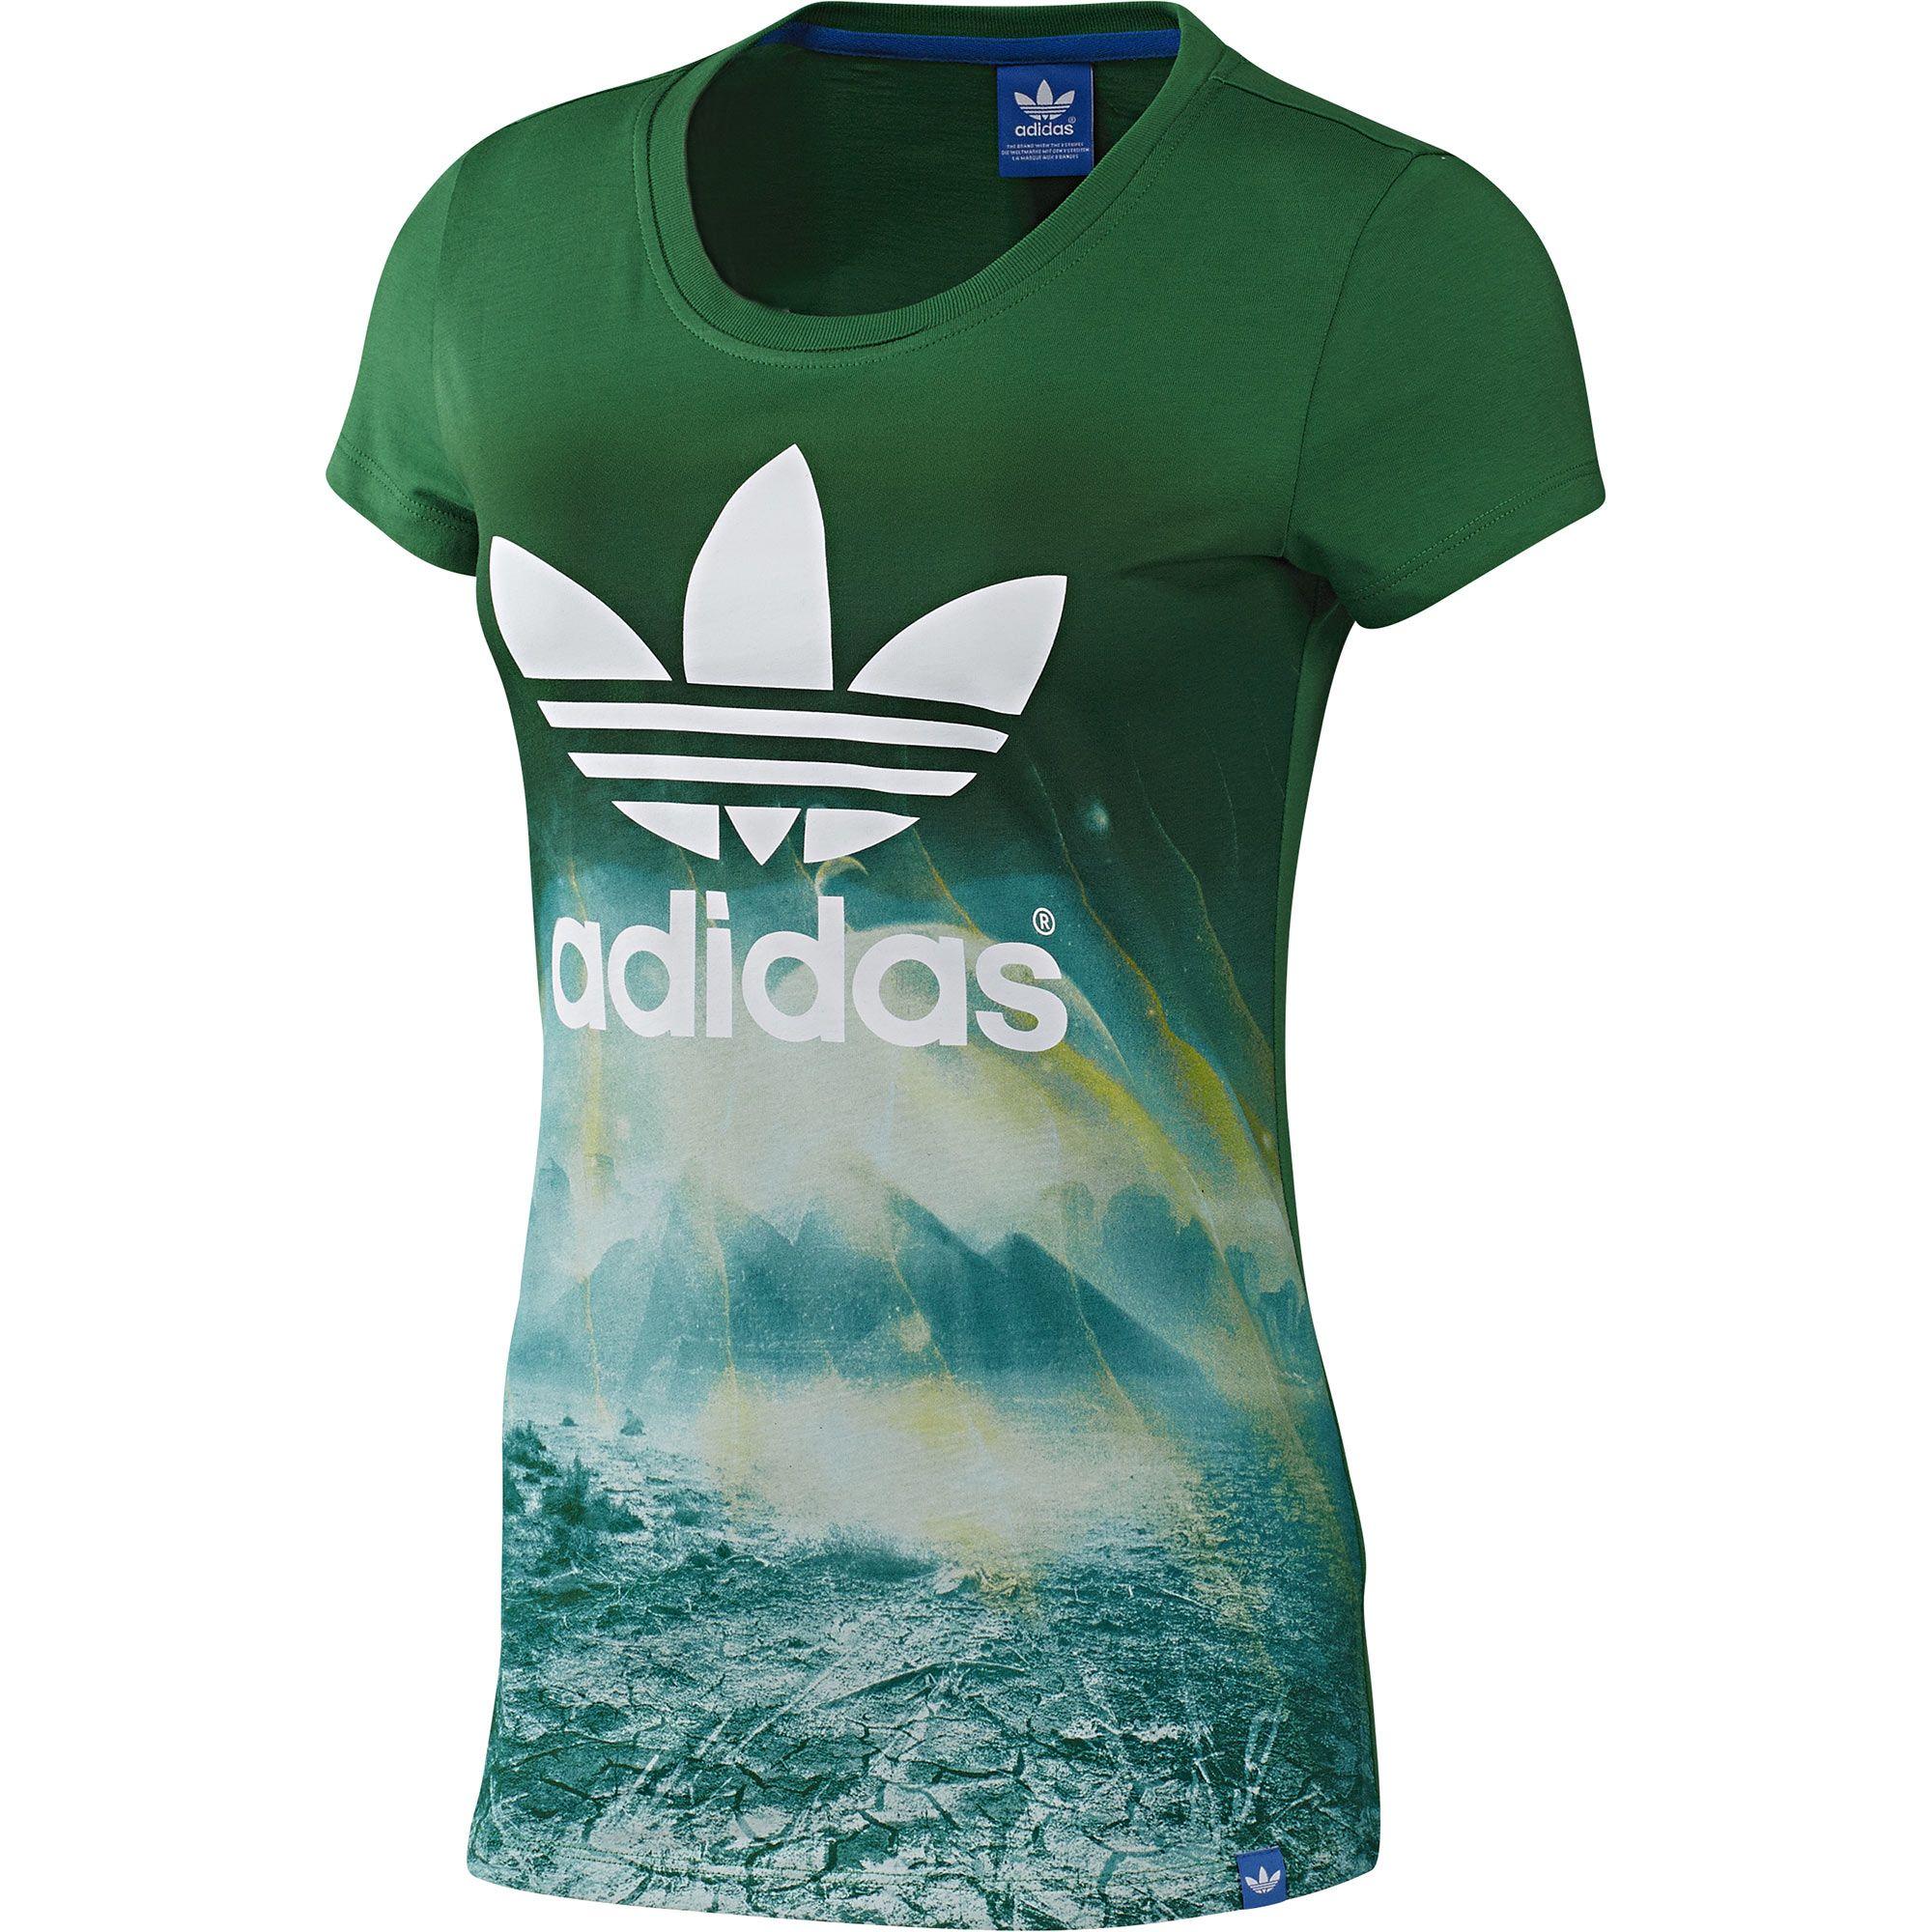 adidas shirt dimension